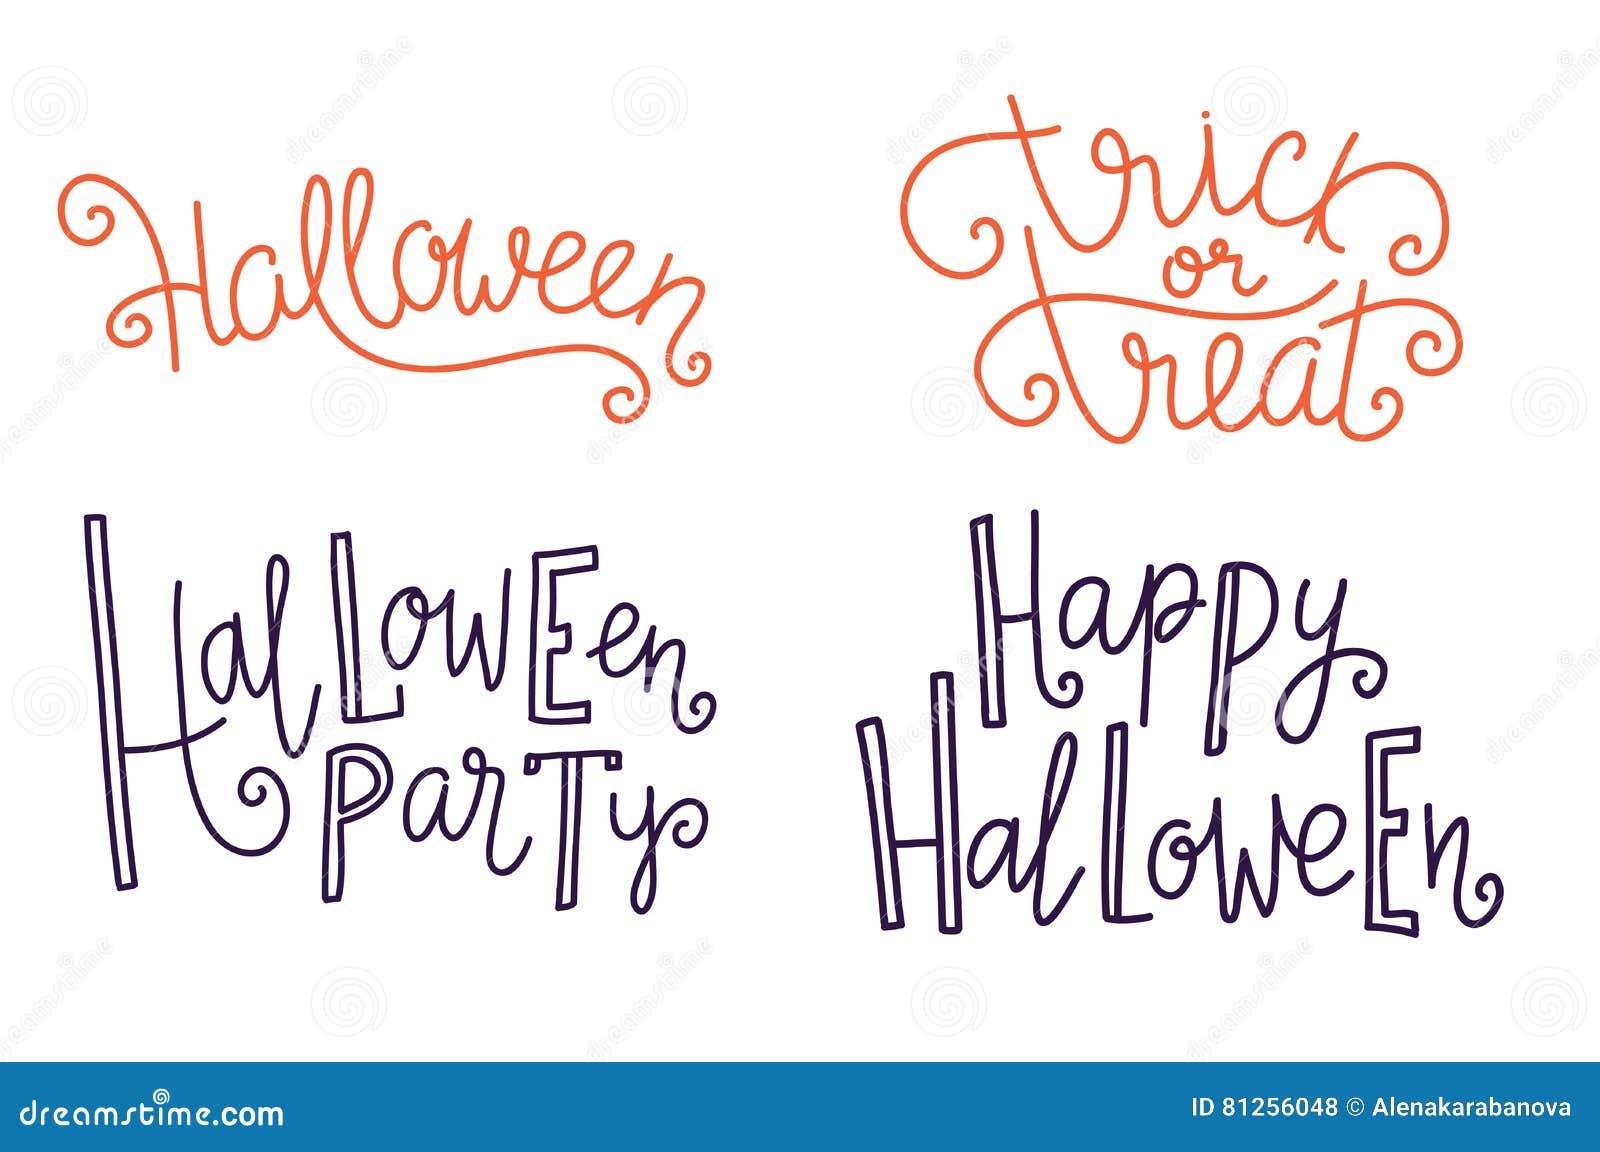 Halloween Greeting Lettering Season Vector Holiday Design Of